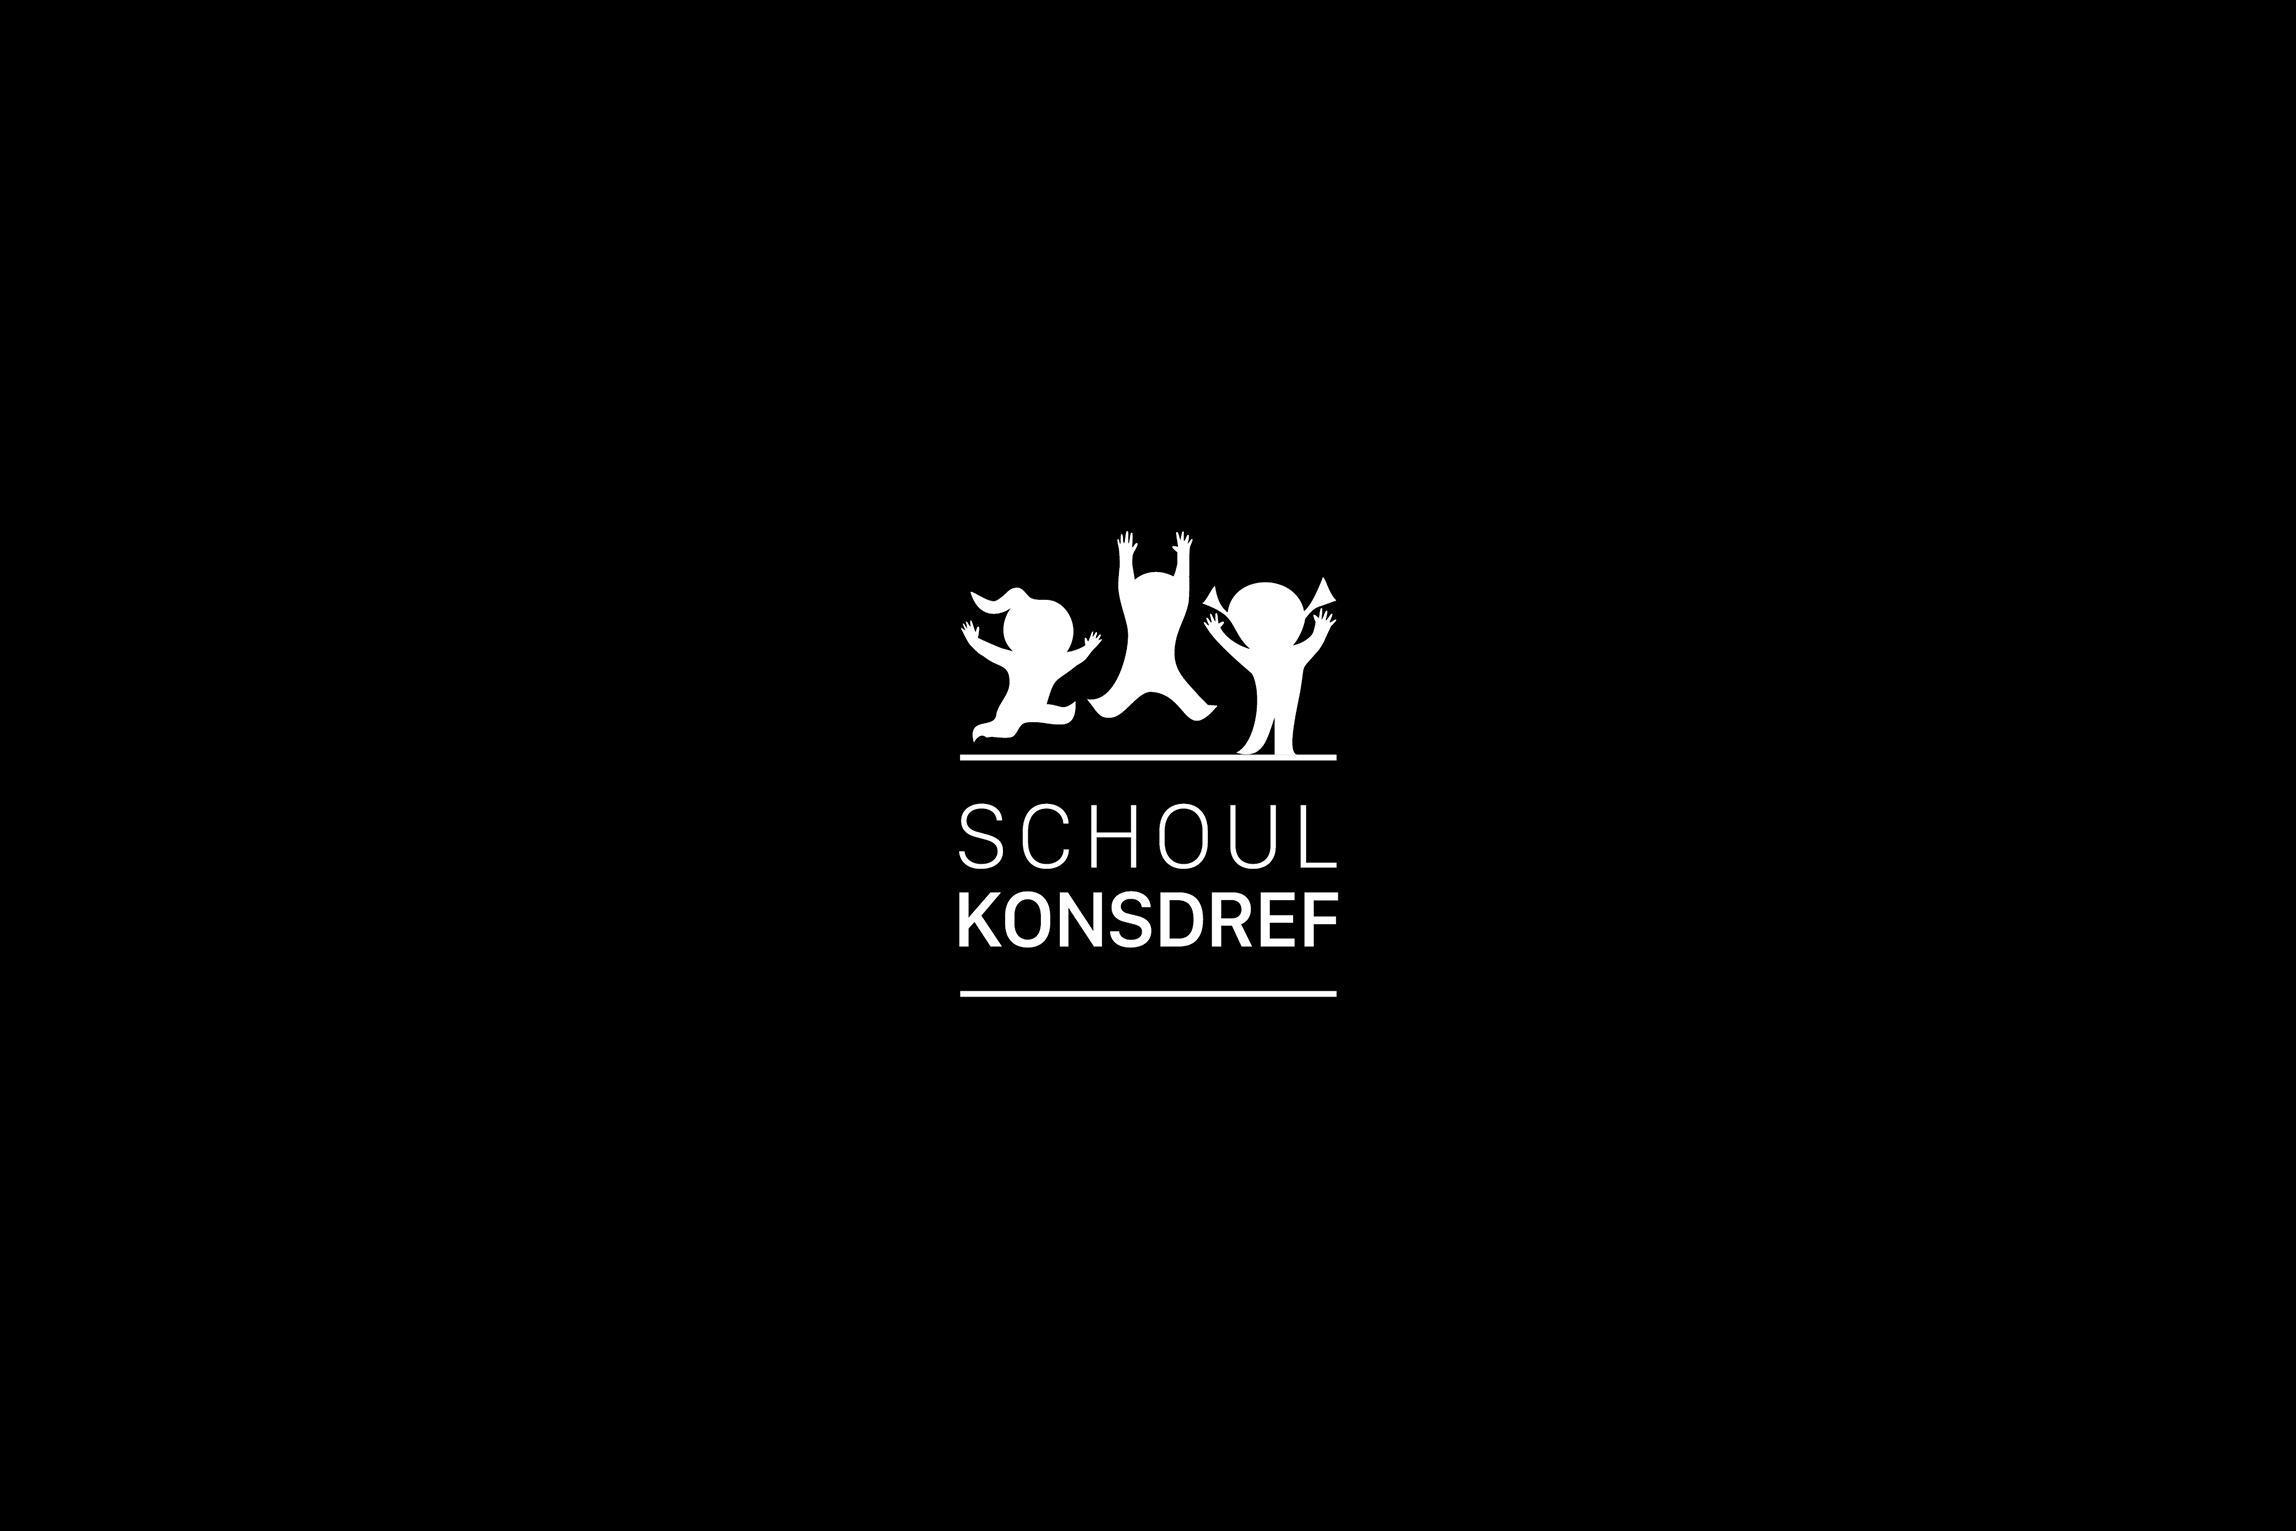 REPERES_Commune de Consdorf_logo_N